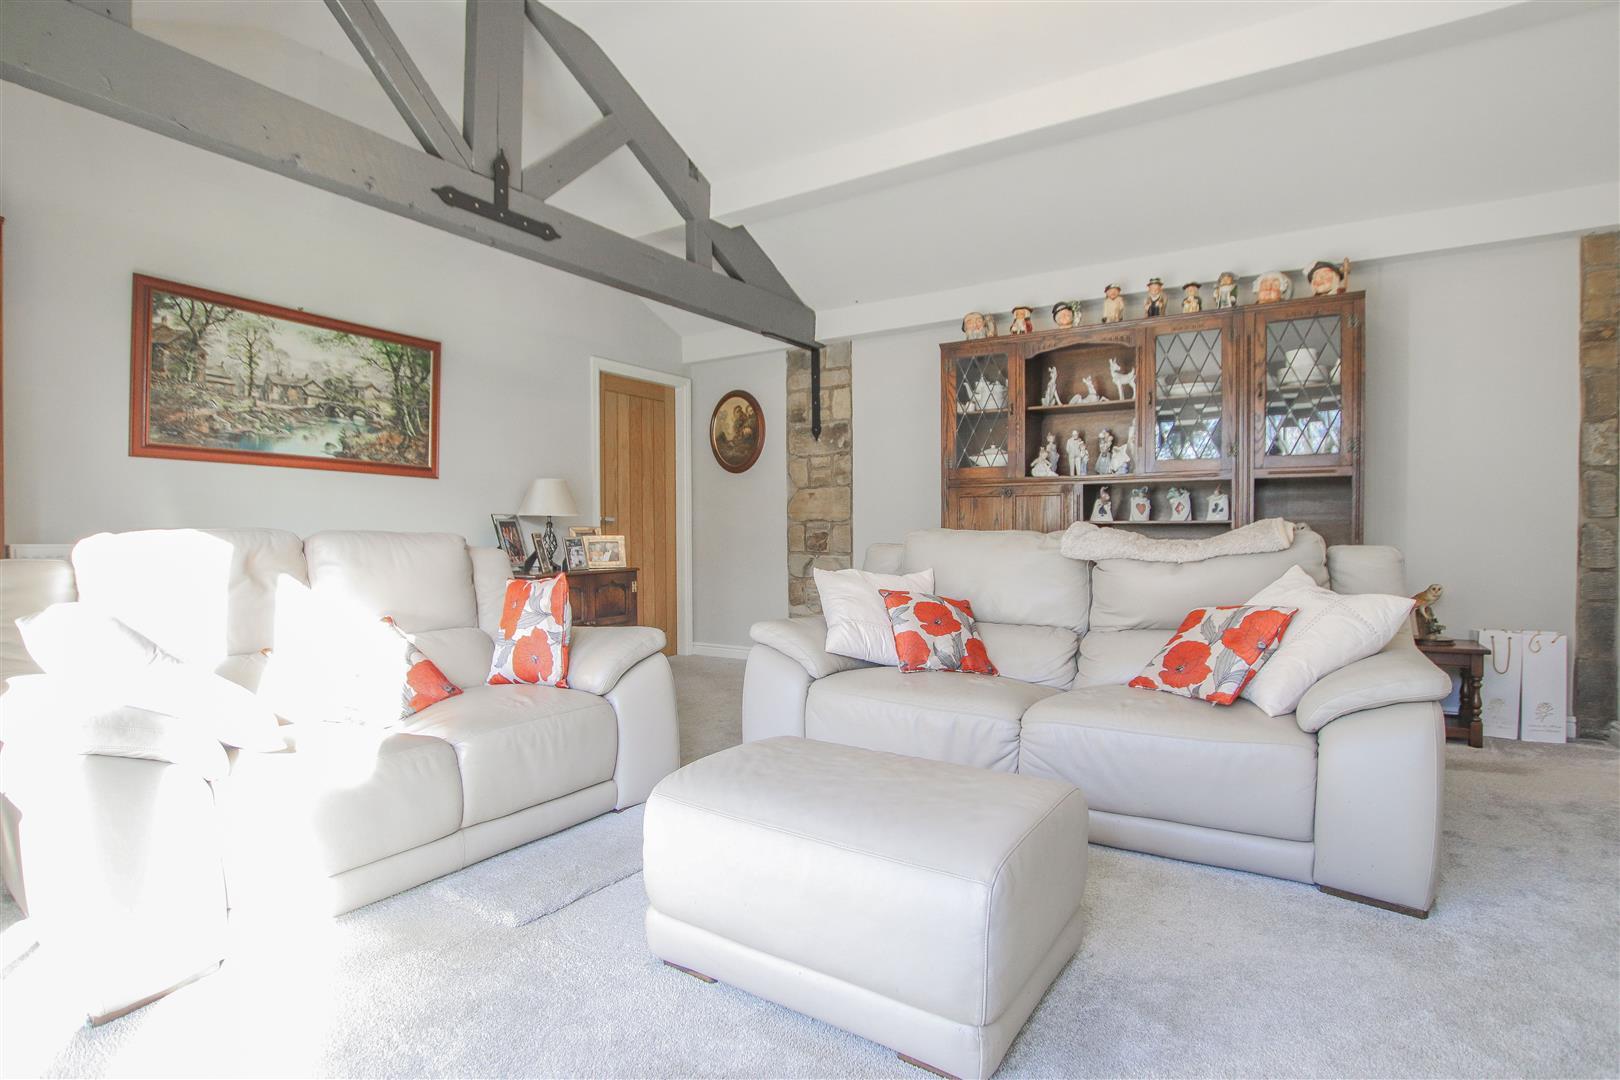 6 Bedroom Barn Conversion For Sale - 51.JPG